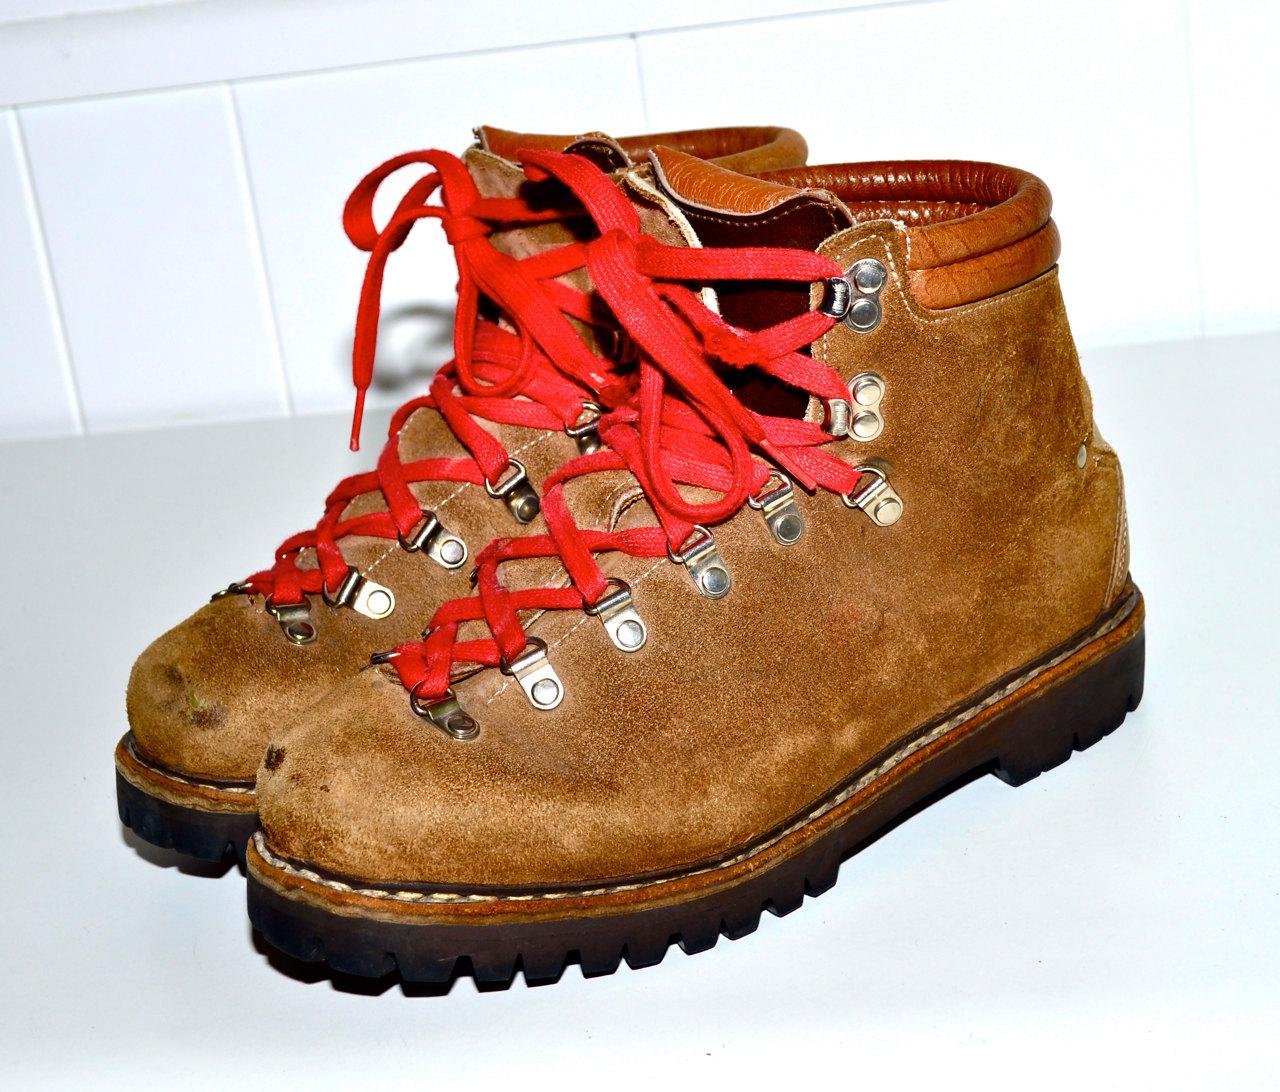 Italian Hiking Boots Vintage Alpine Mountaineering Boots Tan